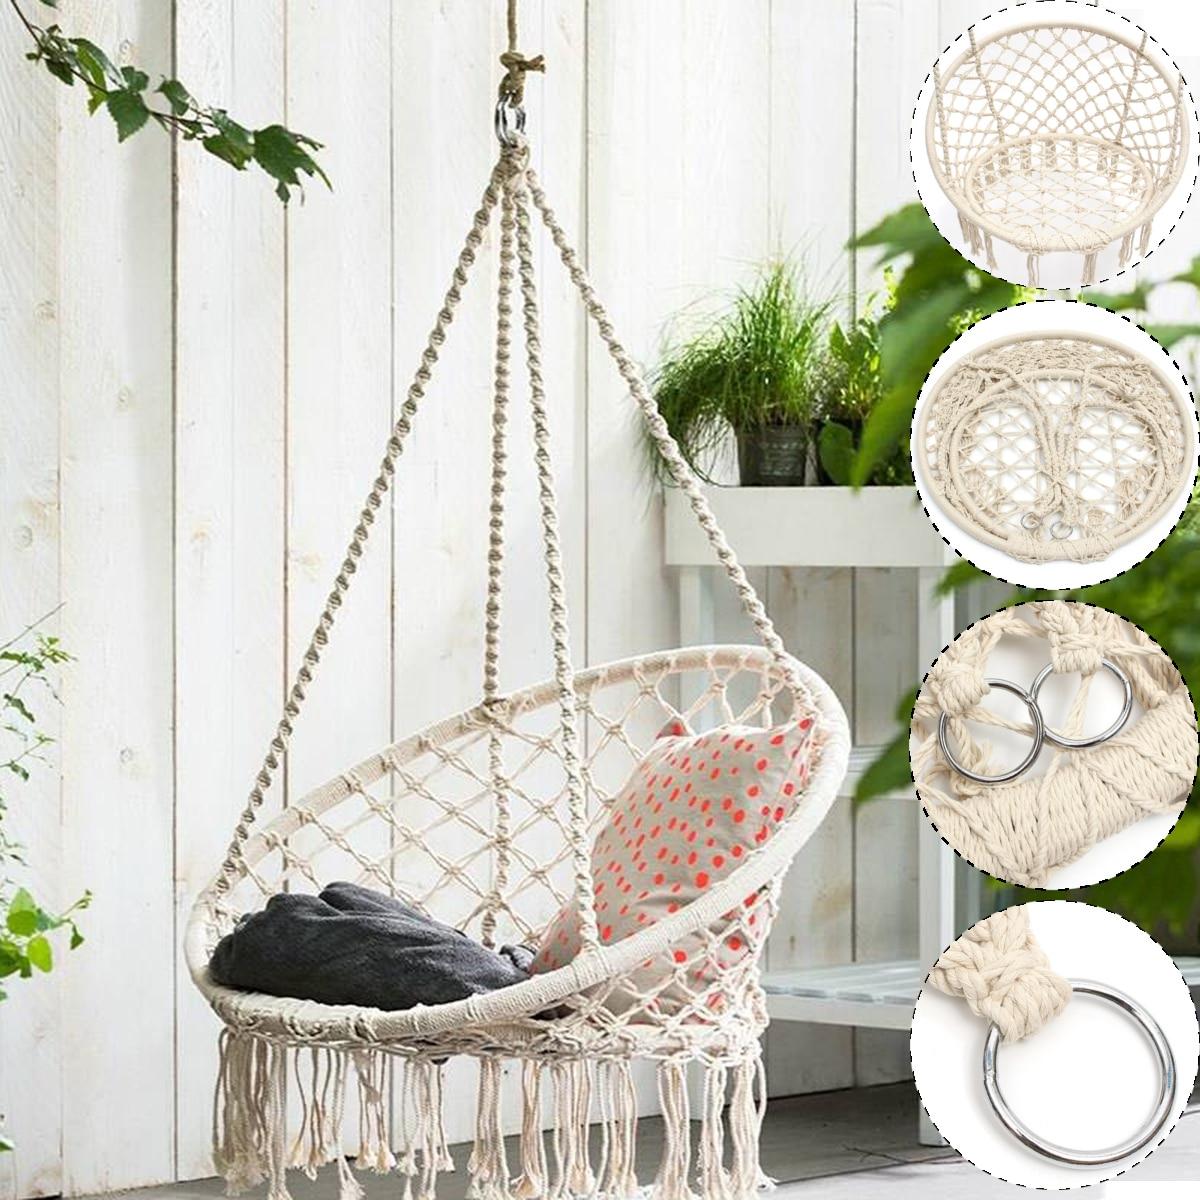 Nordic Cotton Rope Hammock Chair Handmade Knitted Indoor Outdoor Kids Swing Bed Adult Swinging Hanging Chair Hammock